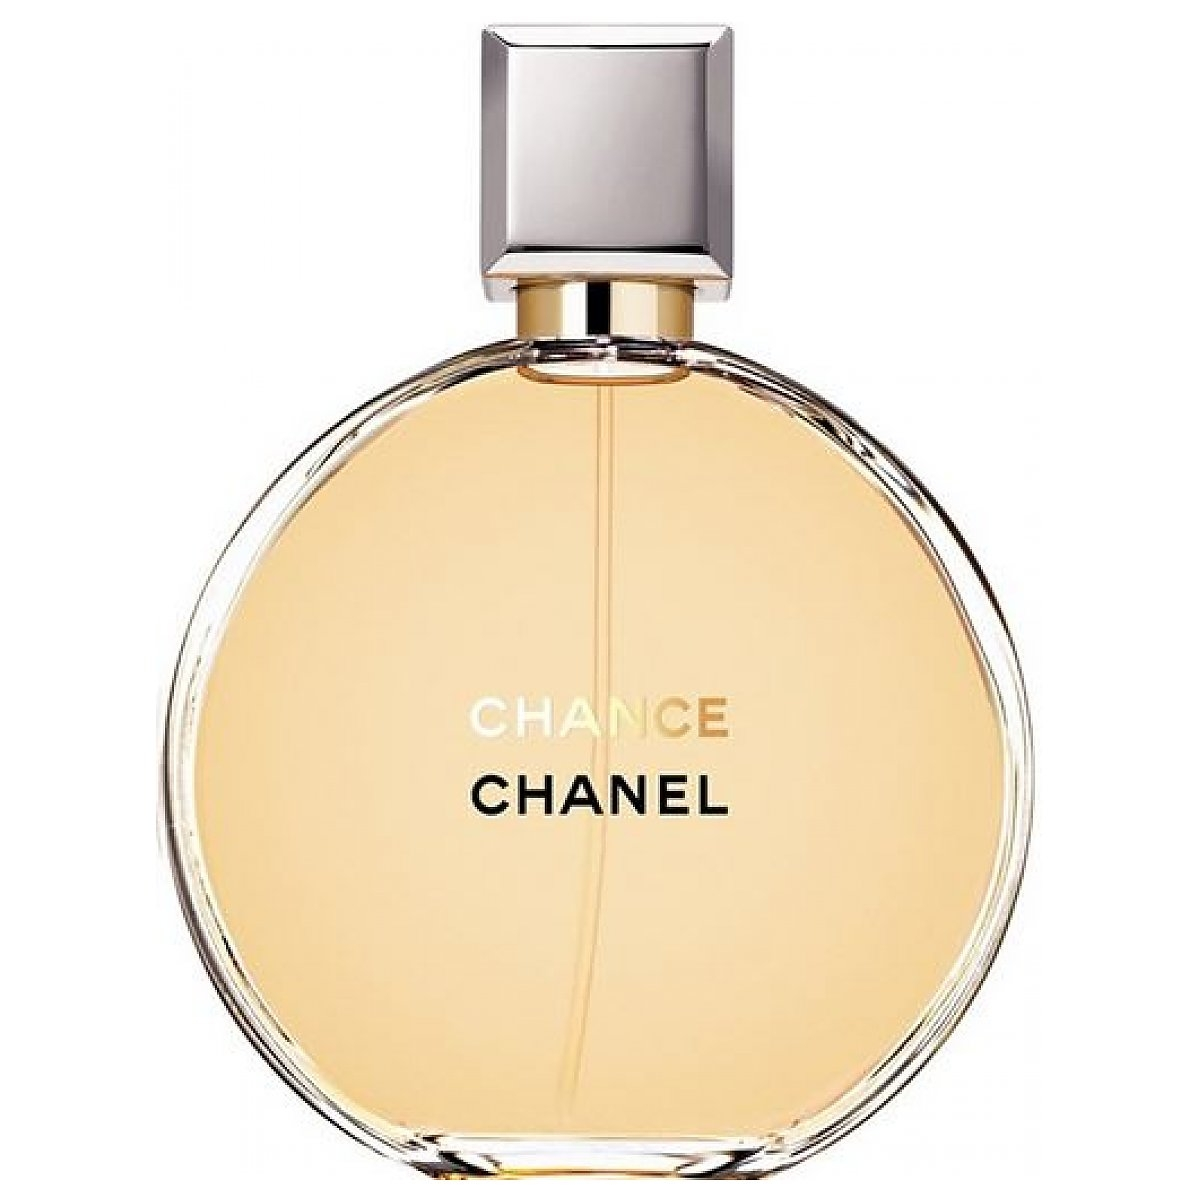 Chanel Chance (W) edp 50ml